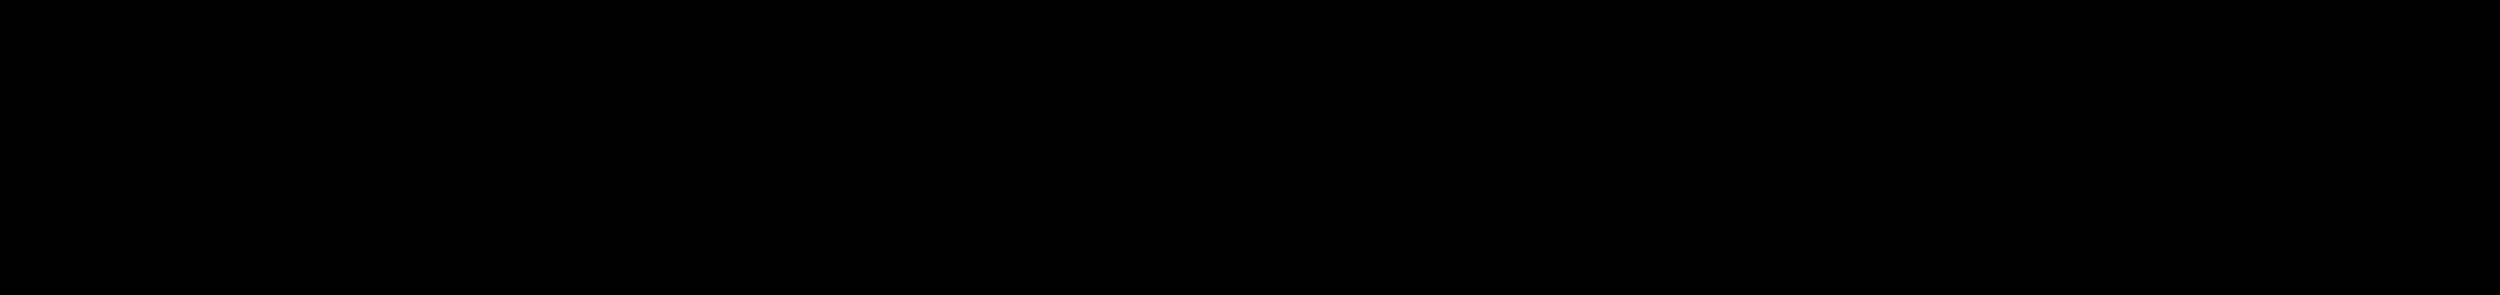 switch2pure_mainlogo1_c25a0f10-418f-43cf-b252-f1a958c2c408.png